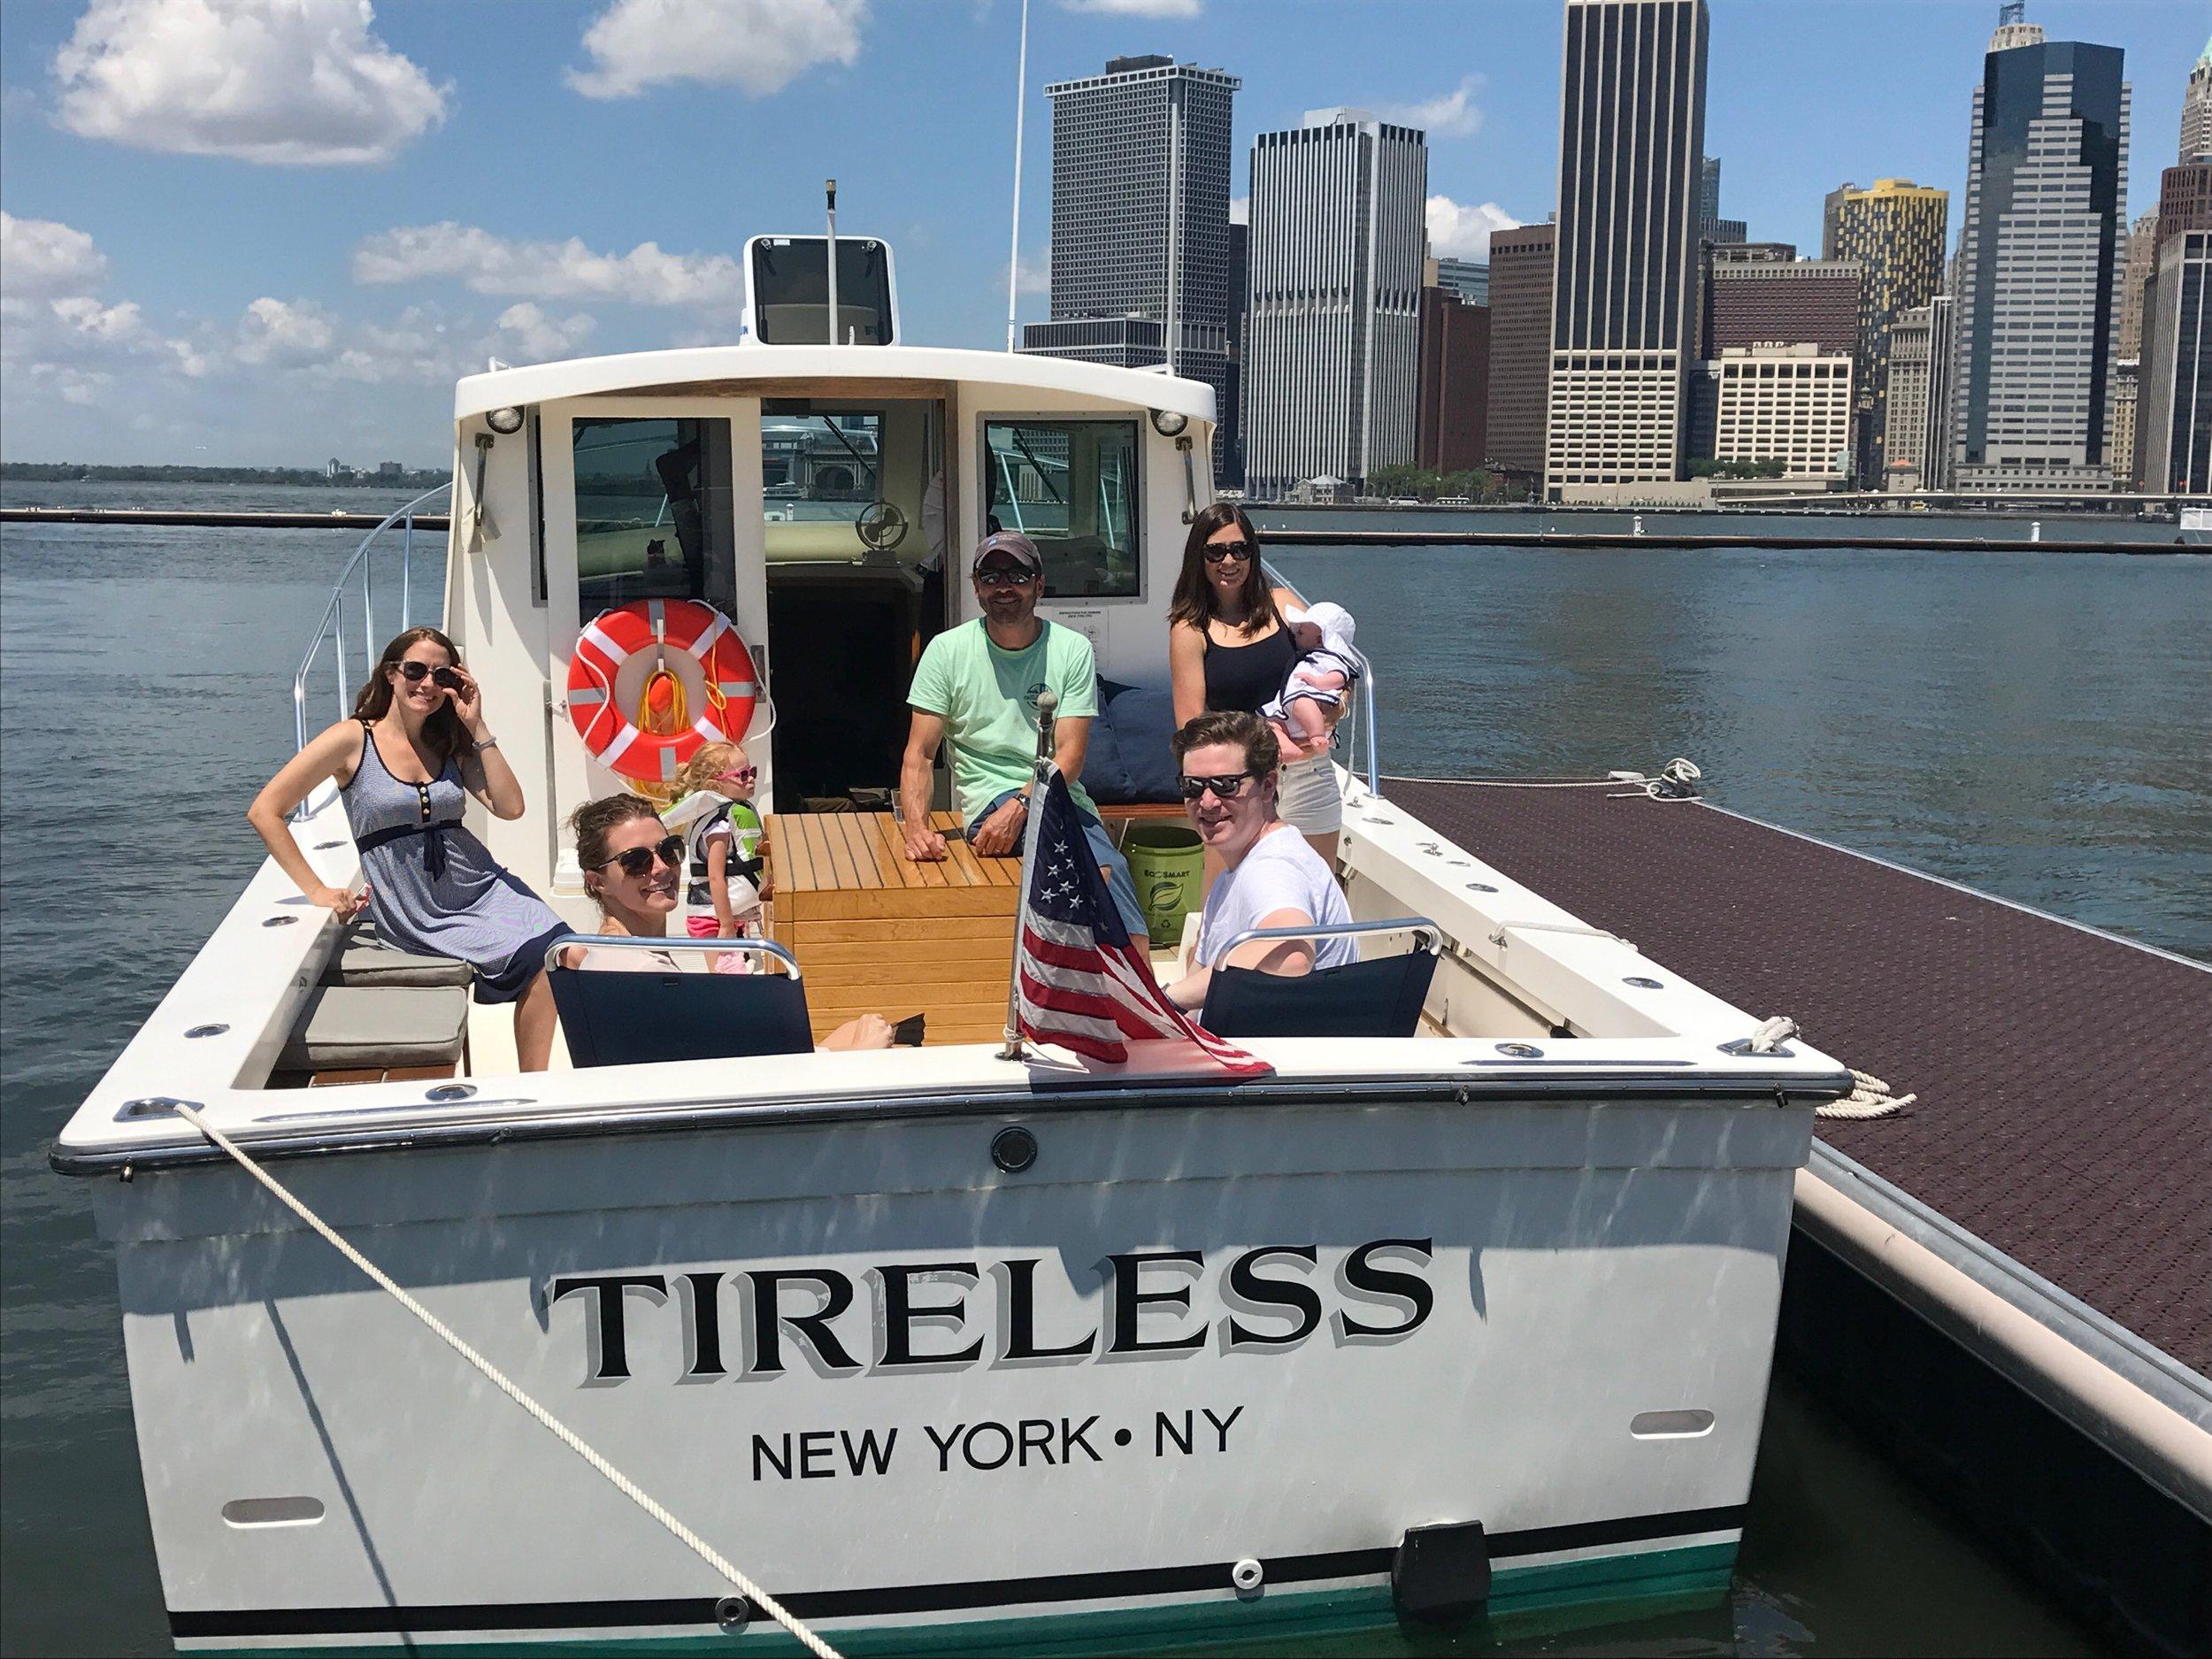 At Brooklyn Dock